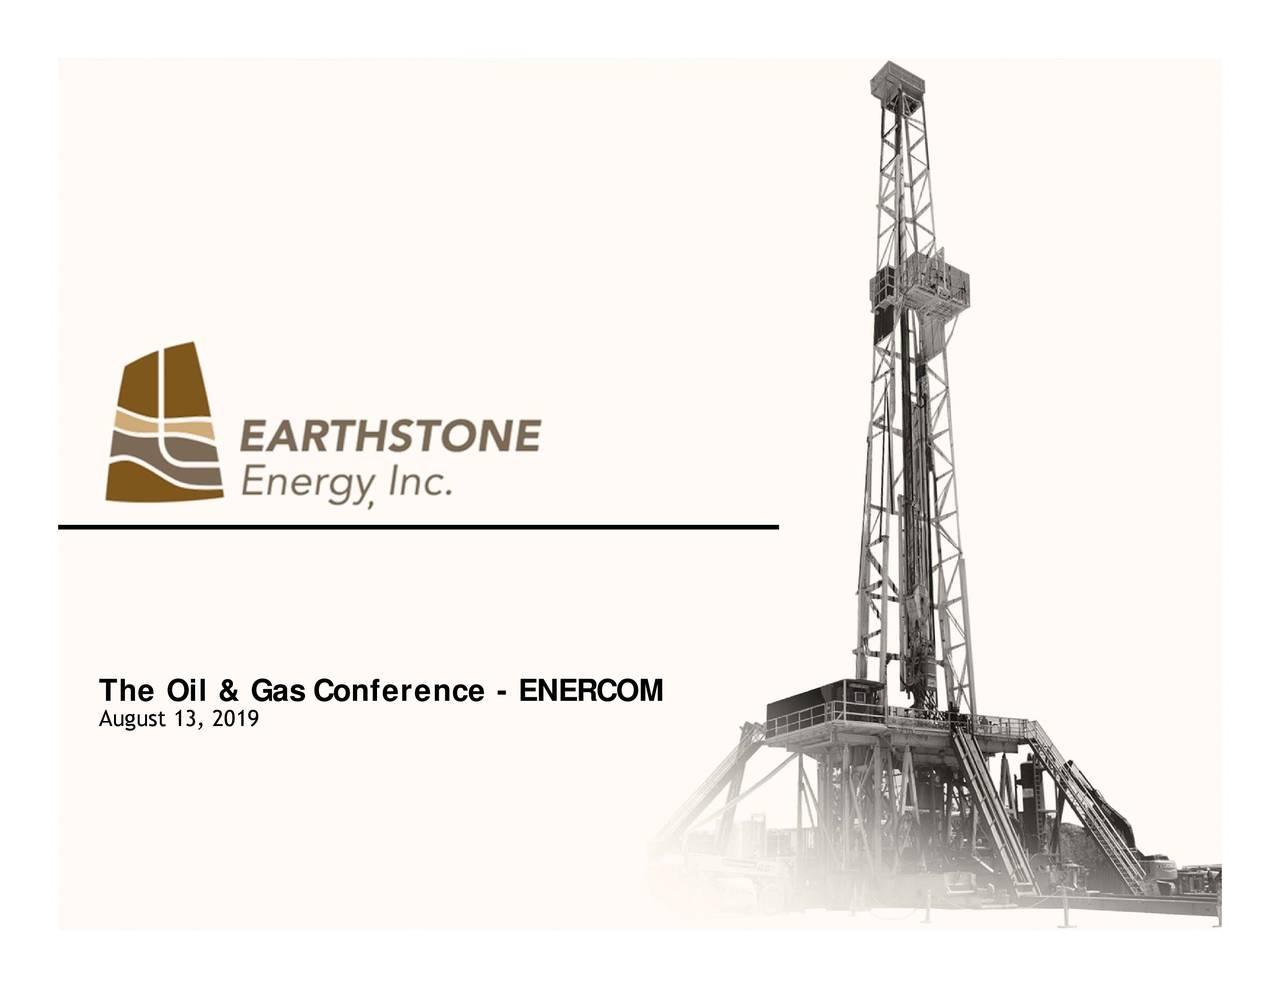 Earthstone Energy (ESTE) Presents At EnerCom Oil & Gas Conference - Slideshow